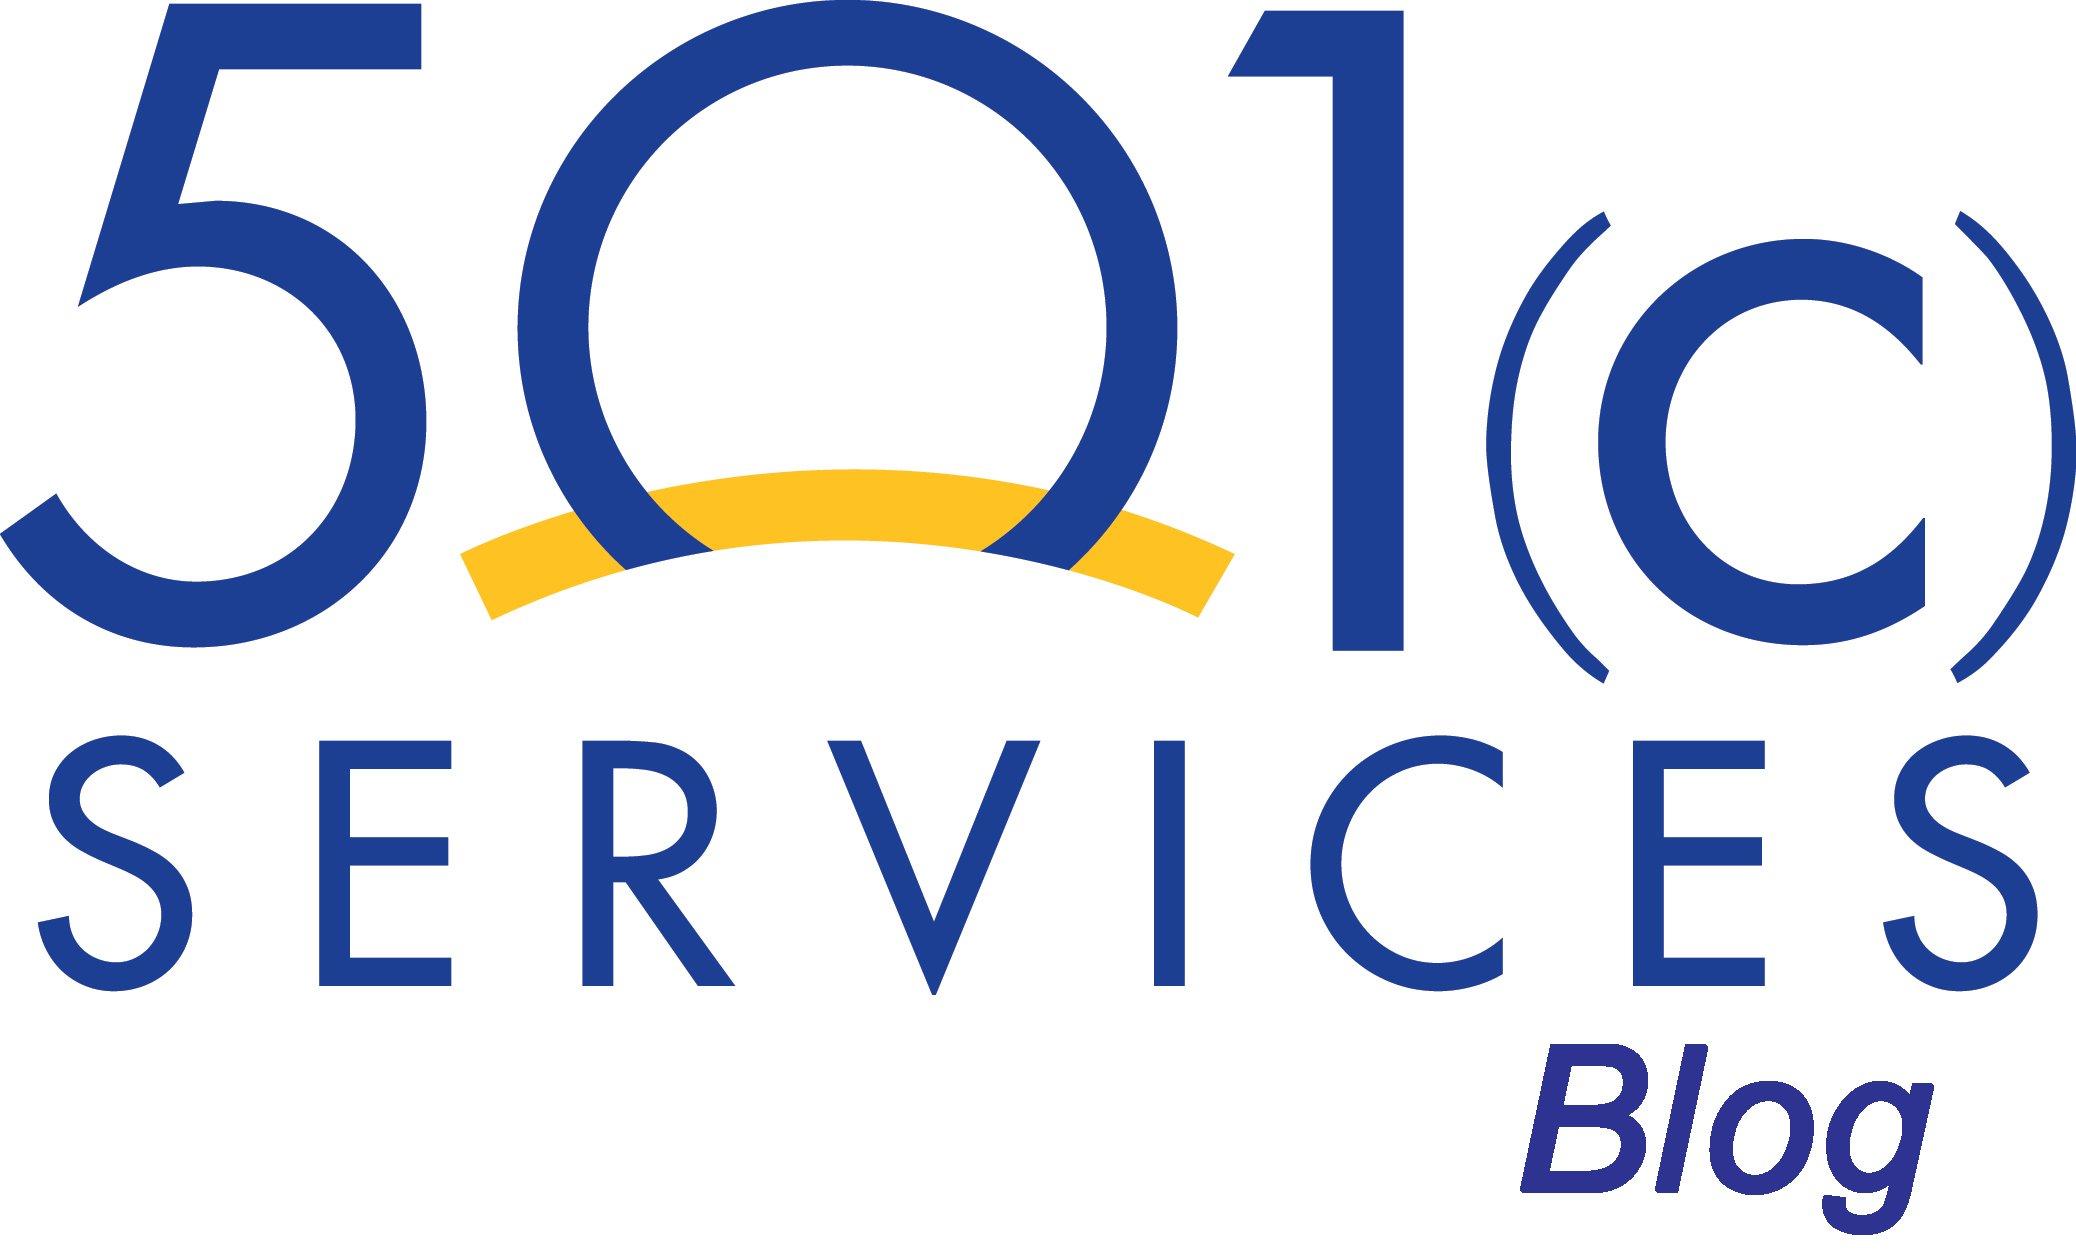 501c Services Blog Link